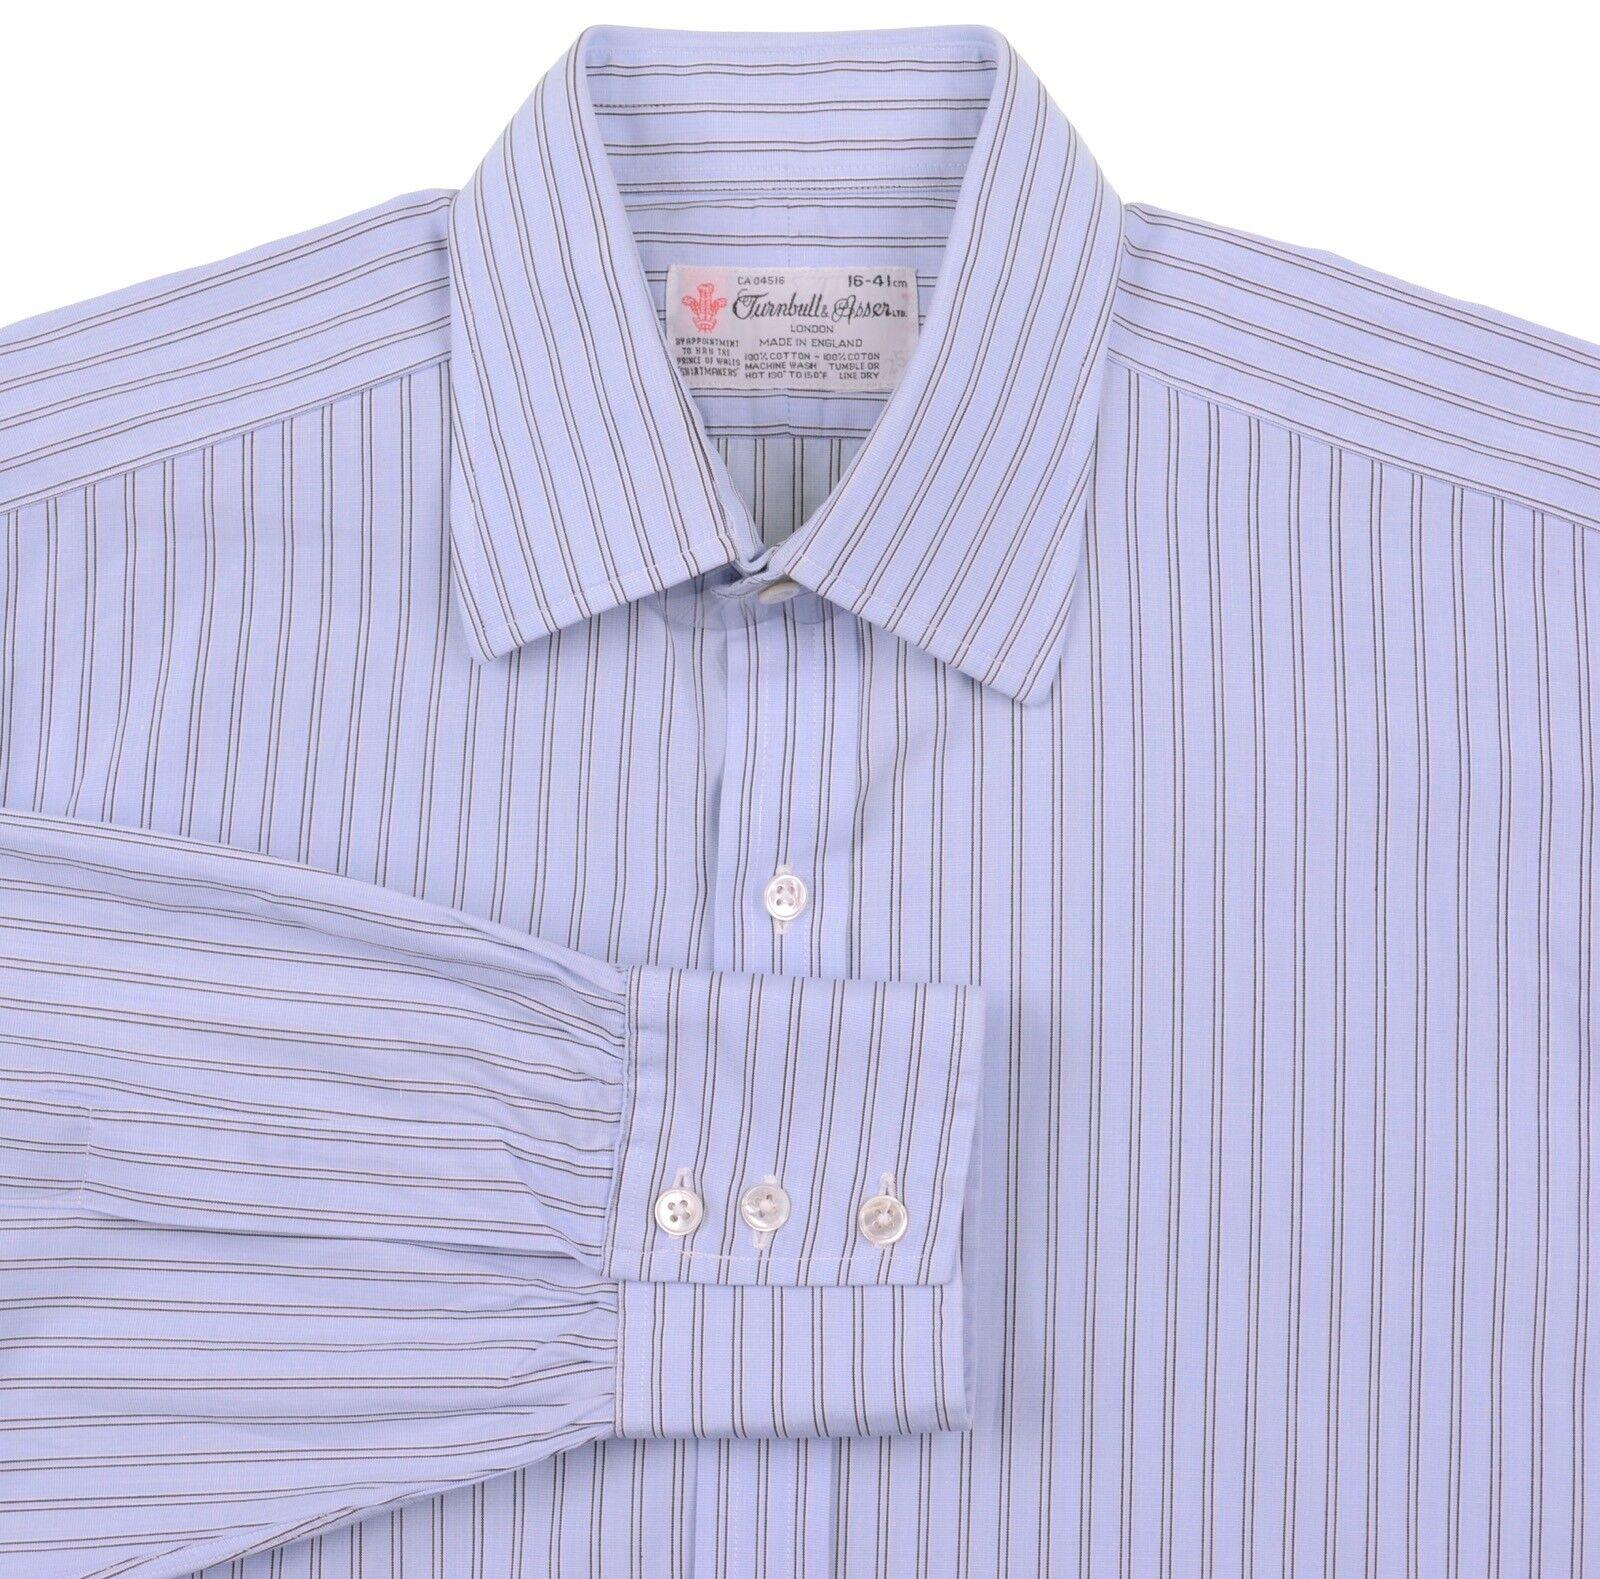 Turnbull & Asser bluee Multi Stripe 100% Cotton Dress Shirt 16